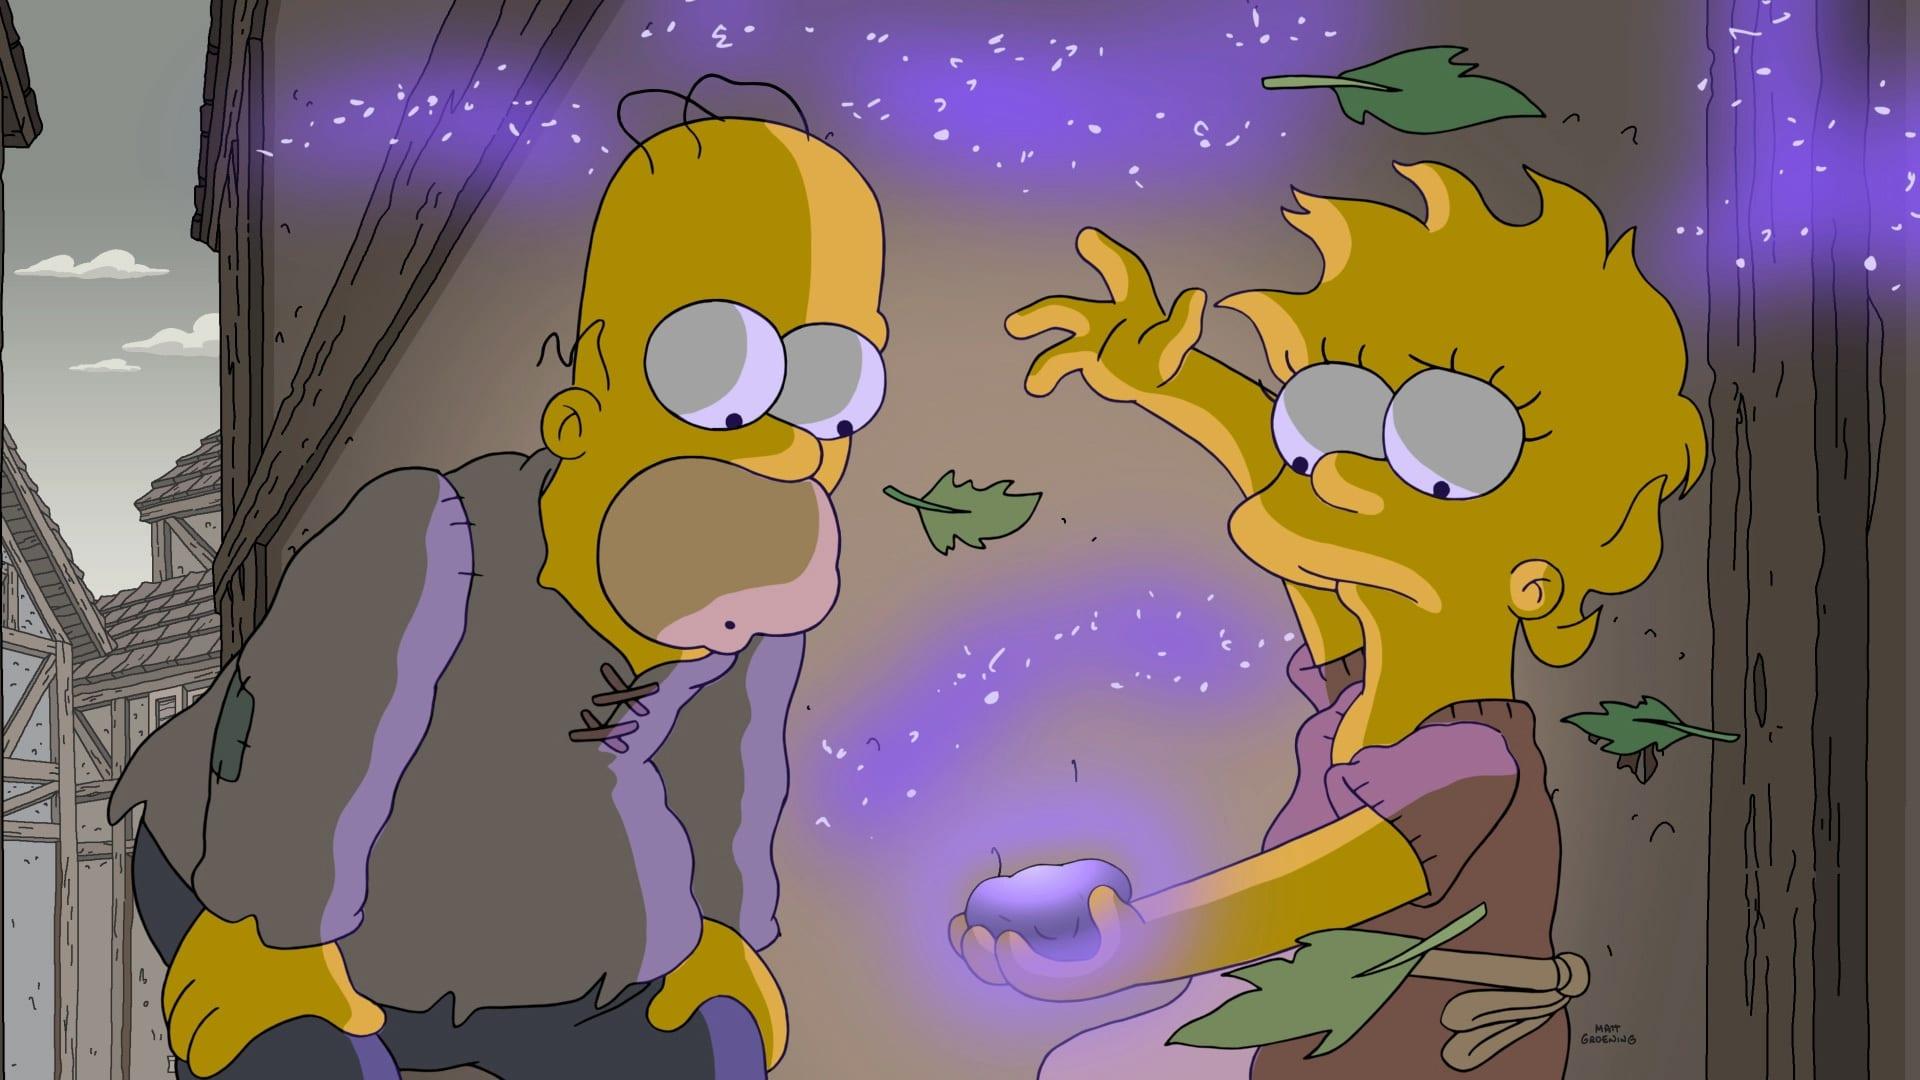 The Simpsons - Season 29 Episode 1 : The Serfsons